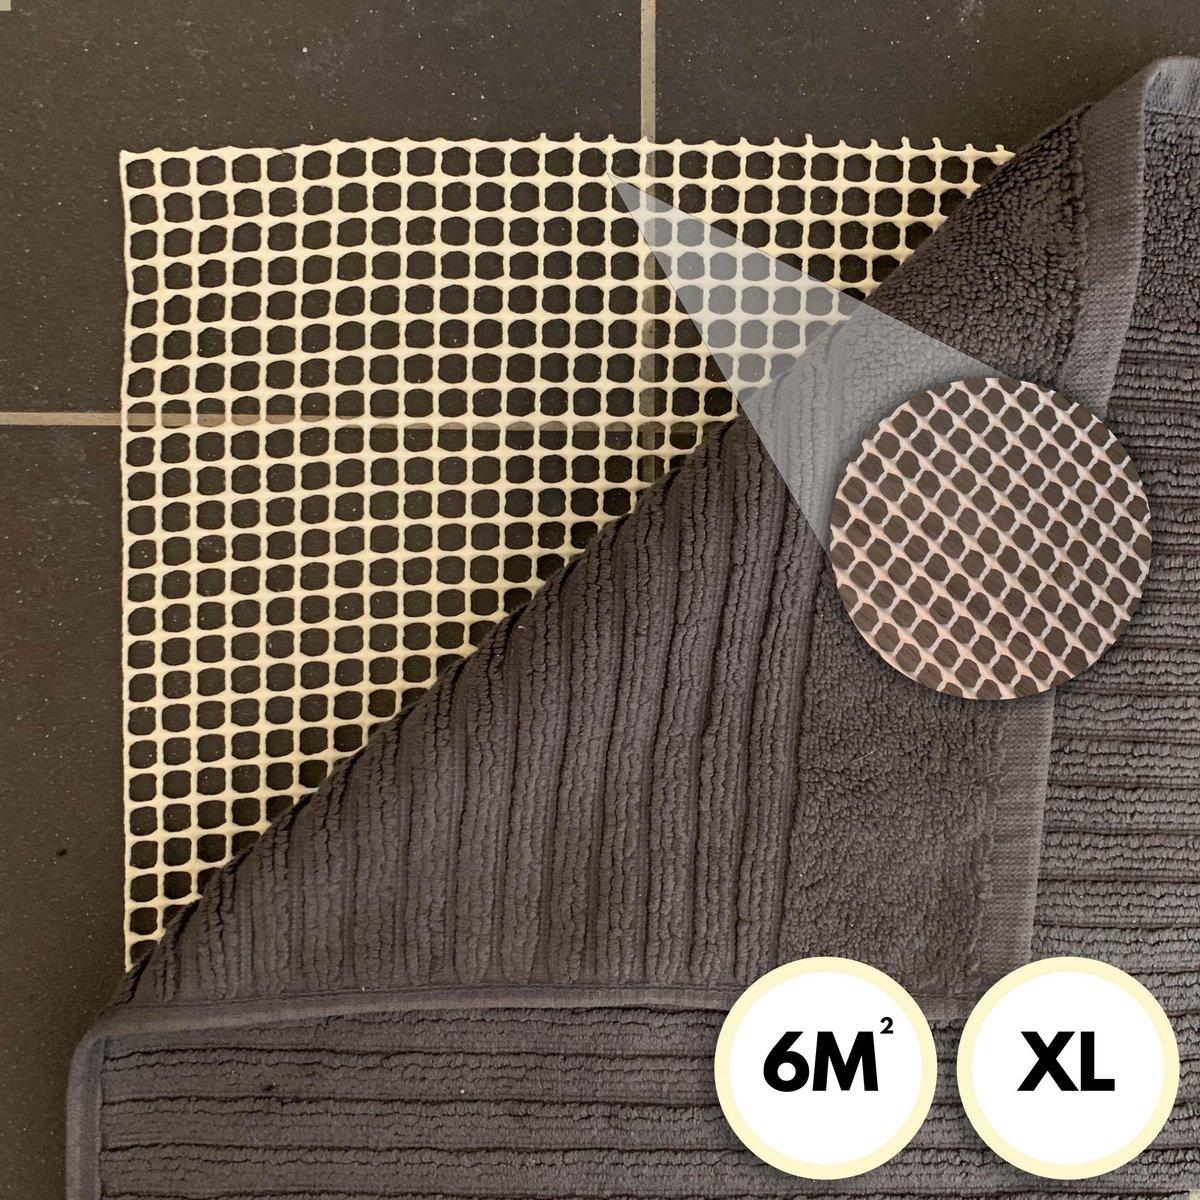 Care-Less Anti Slip Onderkleed - Anti Slip Mat - Antislip Ondertapijt - Antislipmat - 300 x 200cm -